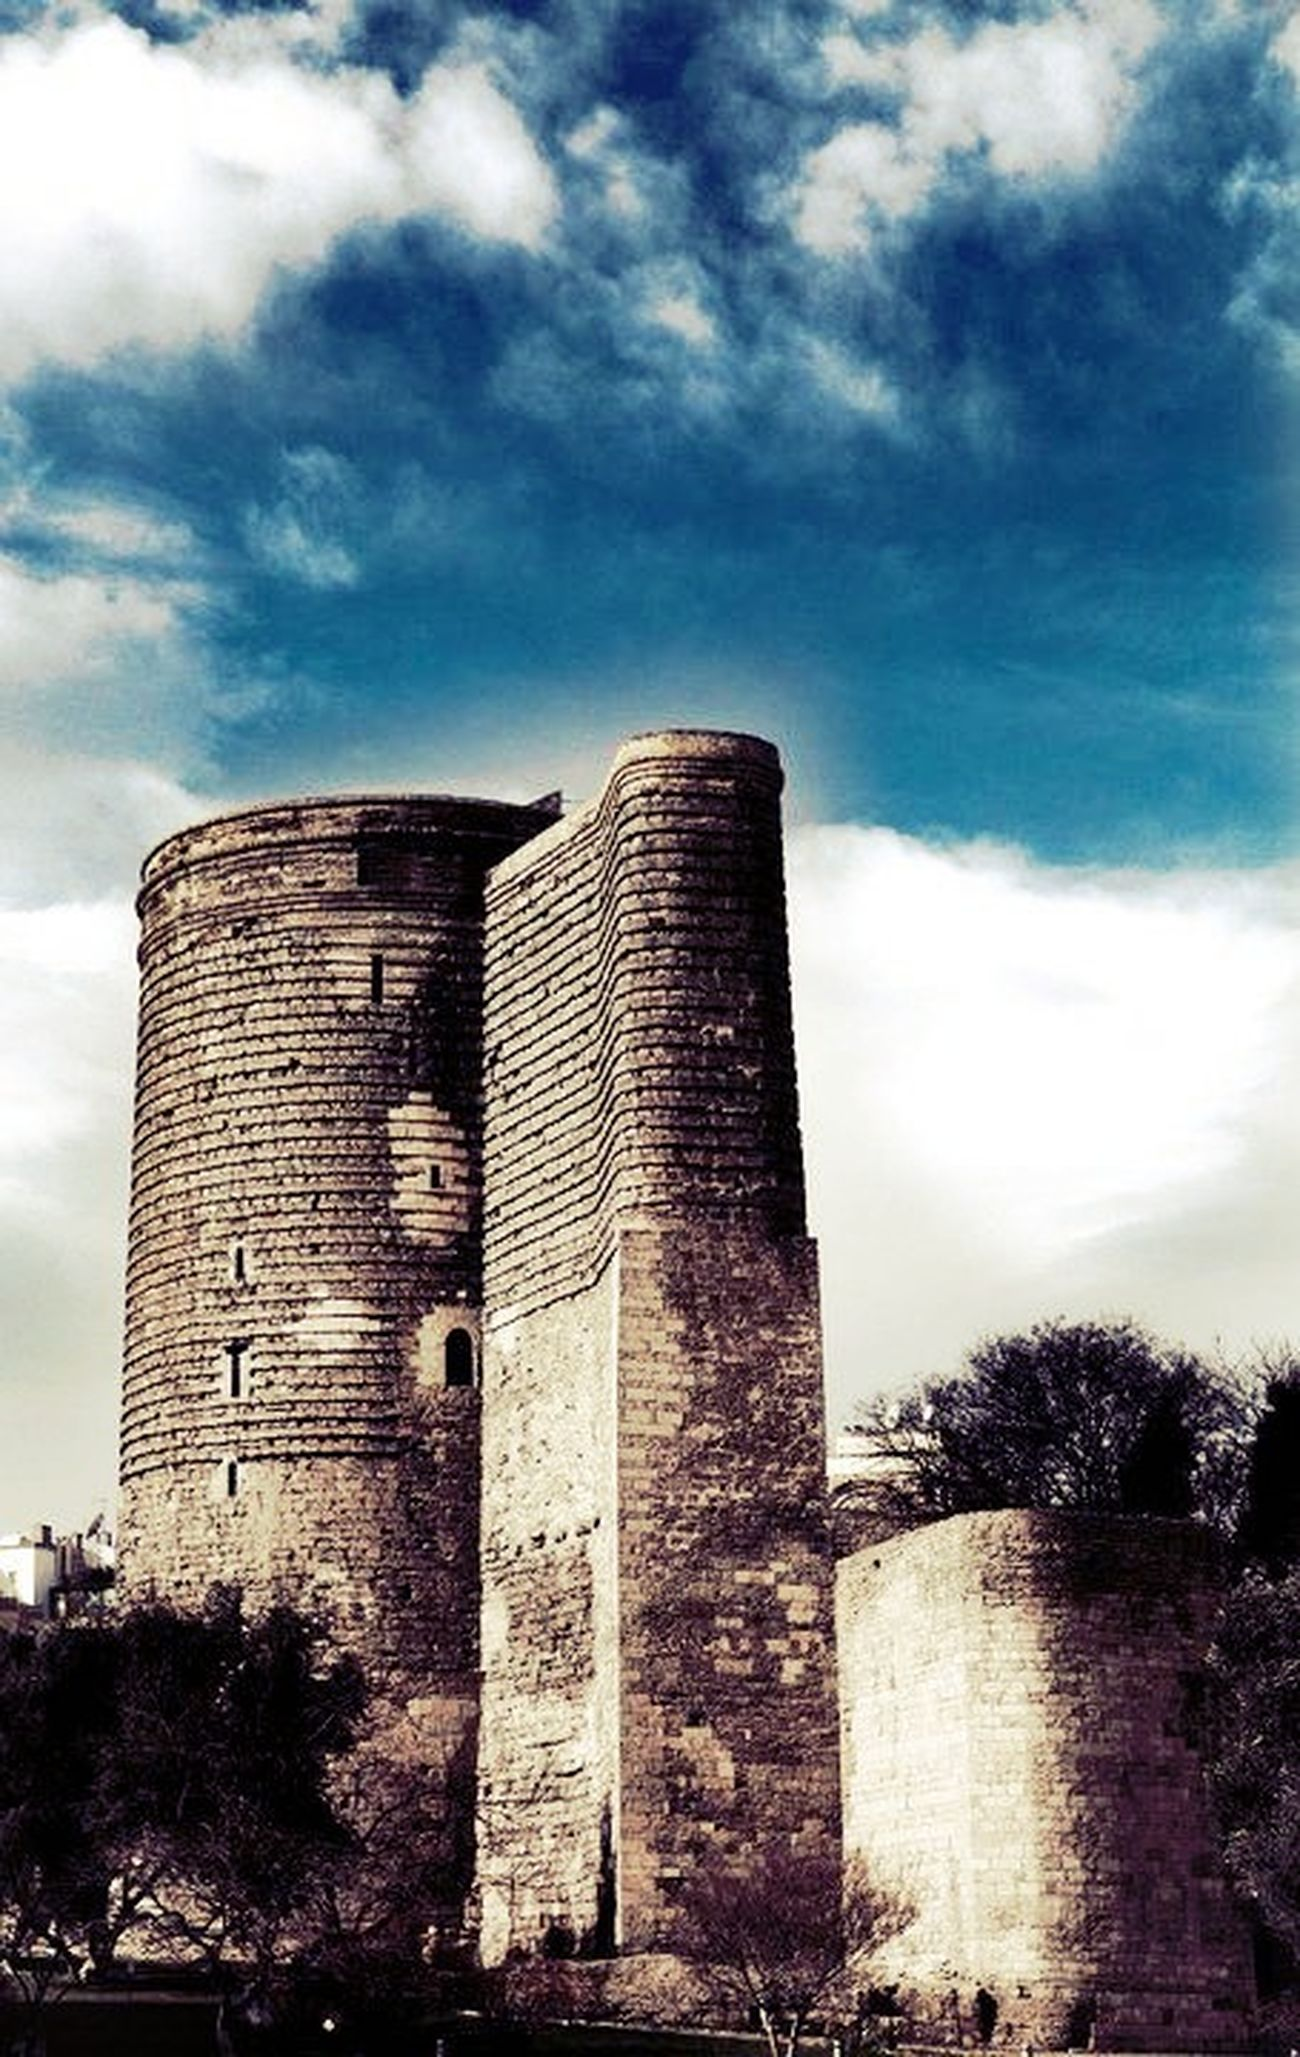 Maiden Tower at Baku - Azerbaijan Maiden Tower